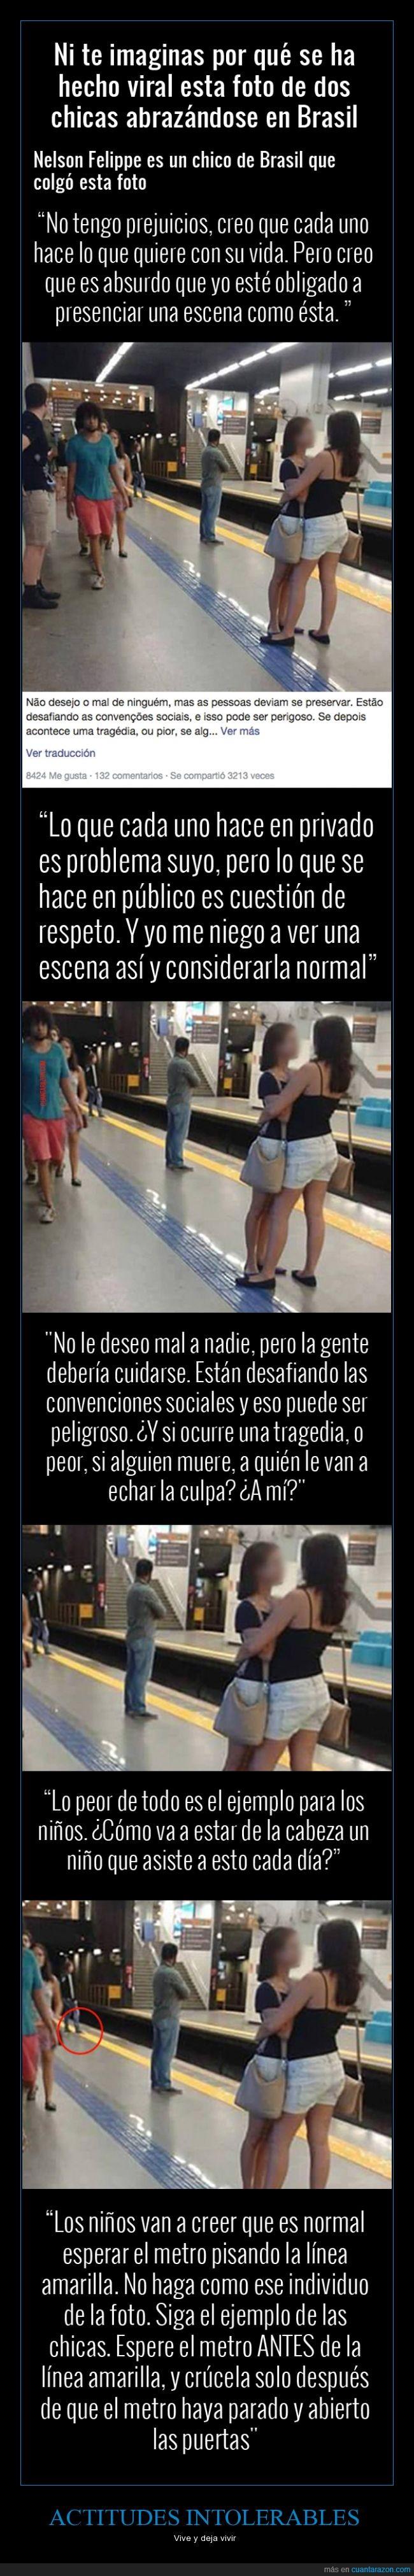 amarilla,andén,brasil,chica,estación,homo,lesbi,línea,metro,niño,pareja,seguridad,tren,vivir